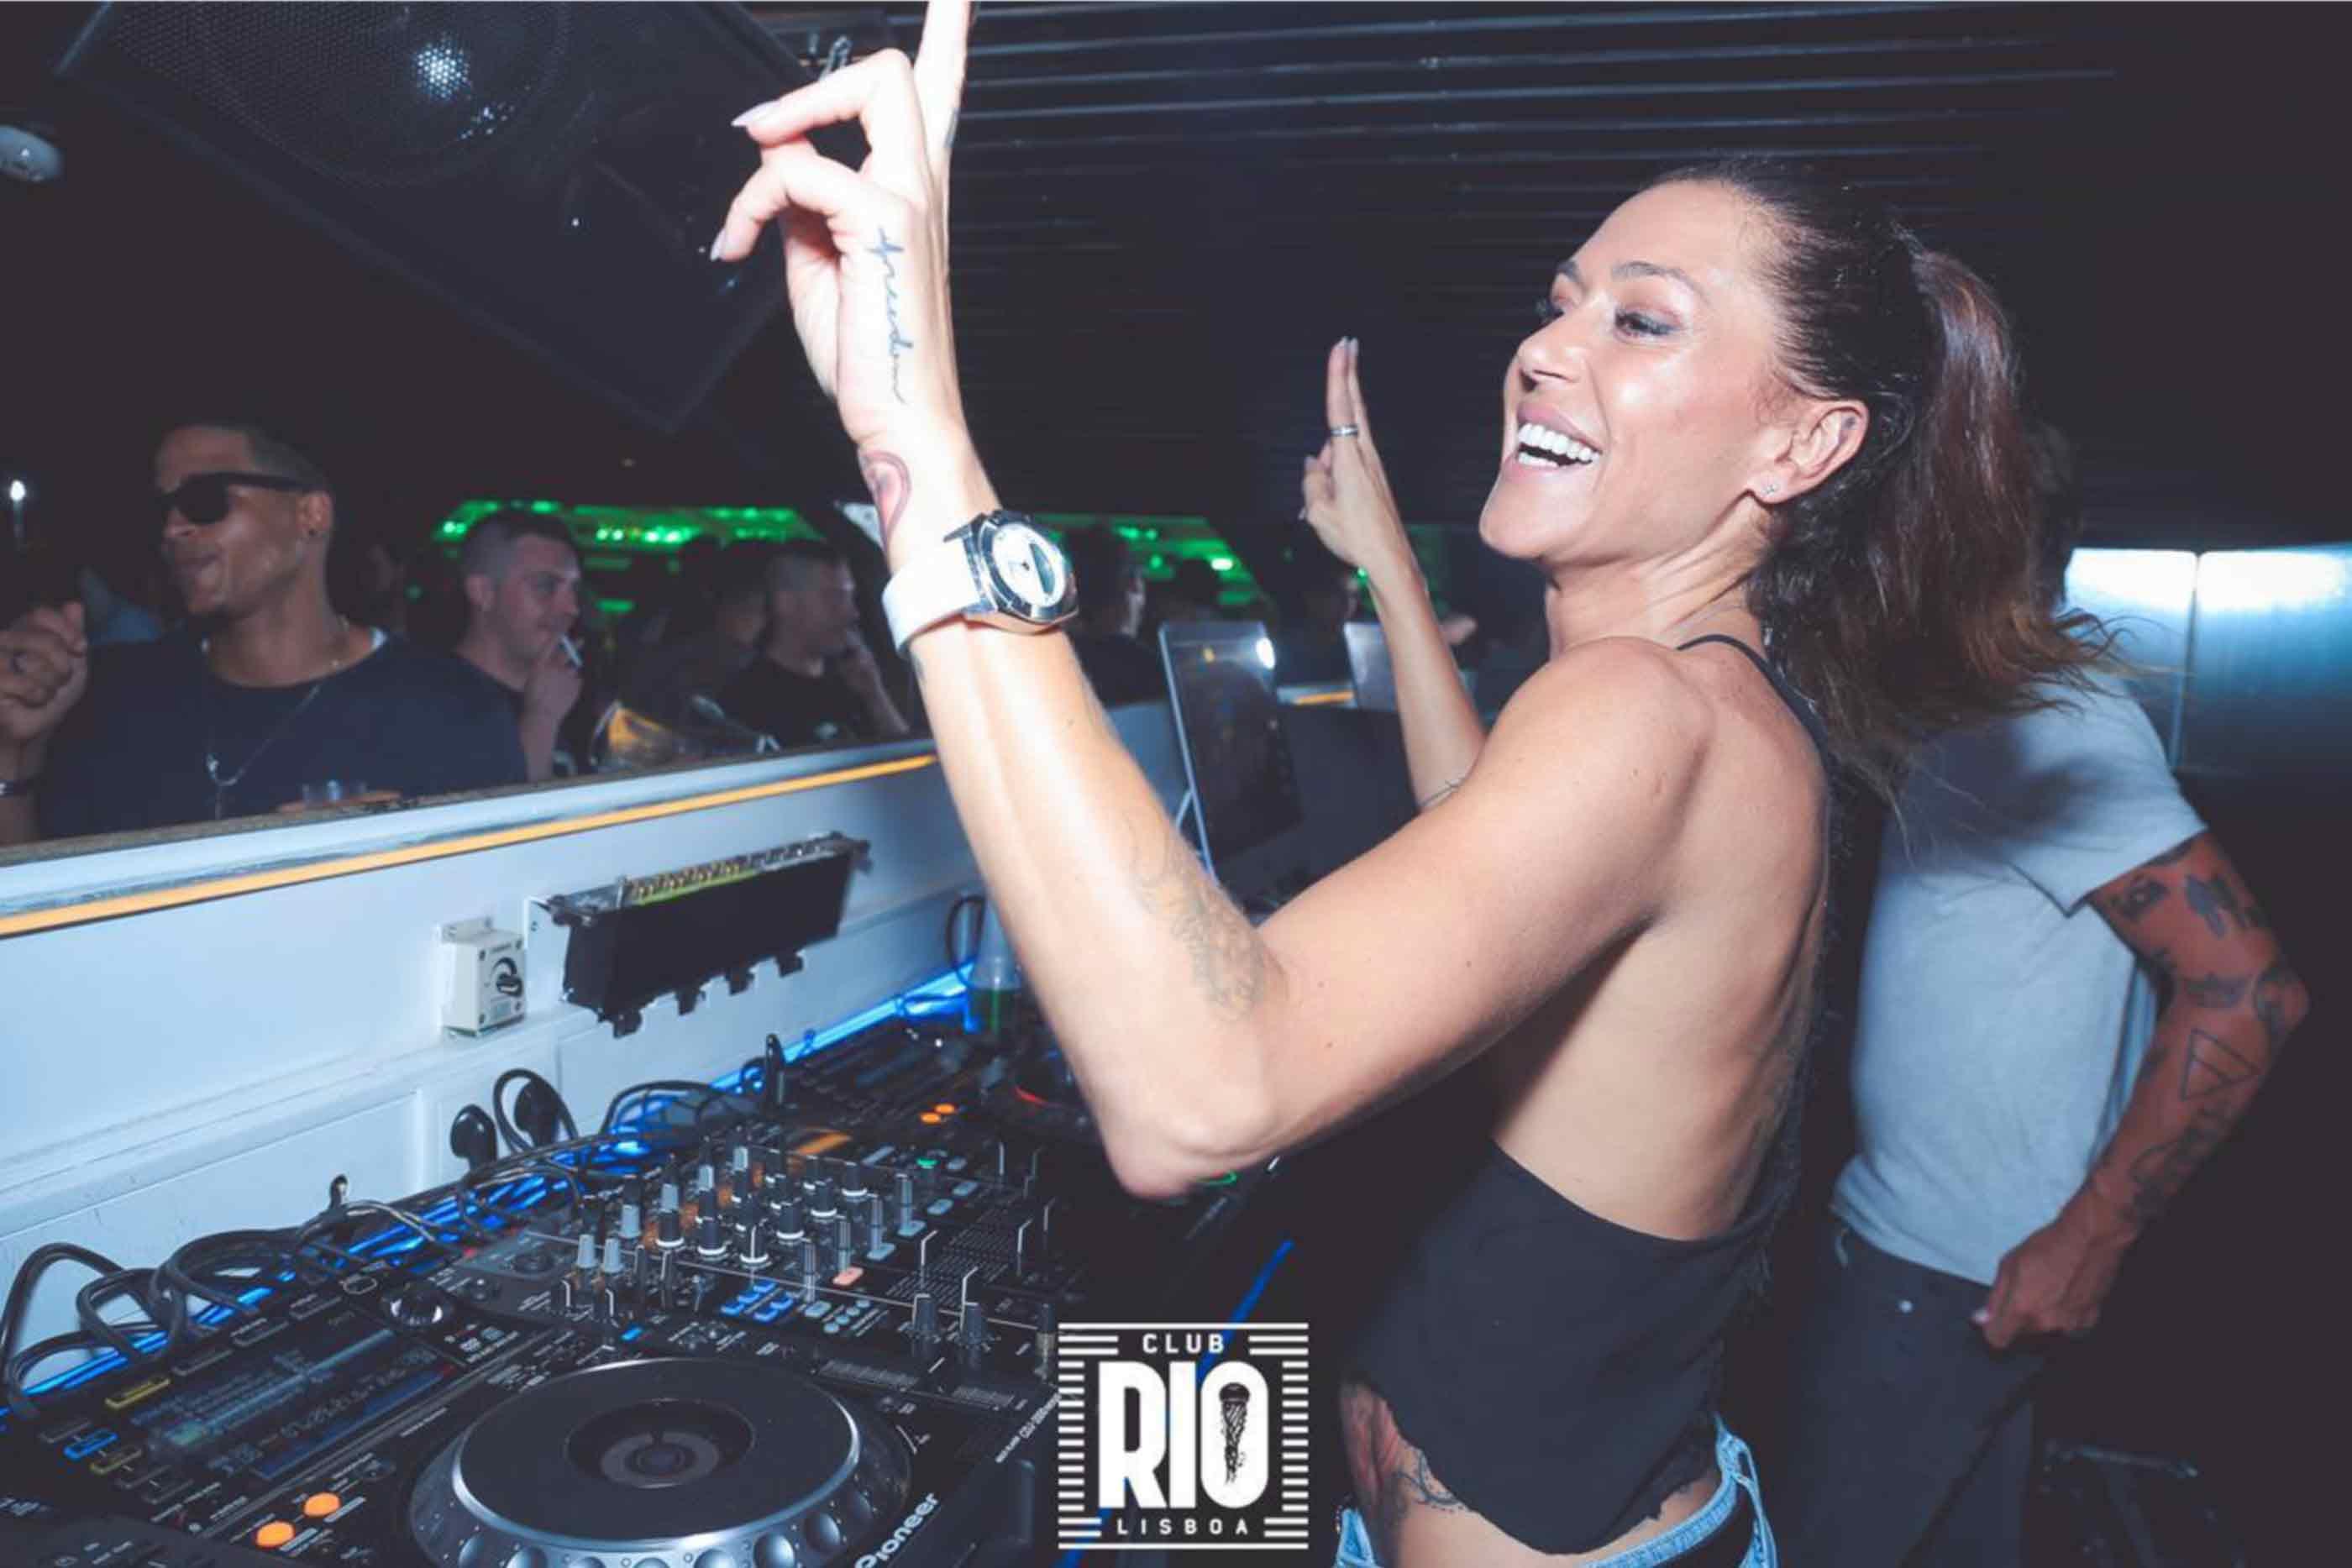 Dj a pôr música no Club Rio Lisboa, onde predomina maioritariamente música internacional eletrónica.